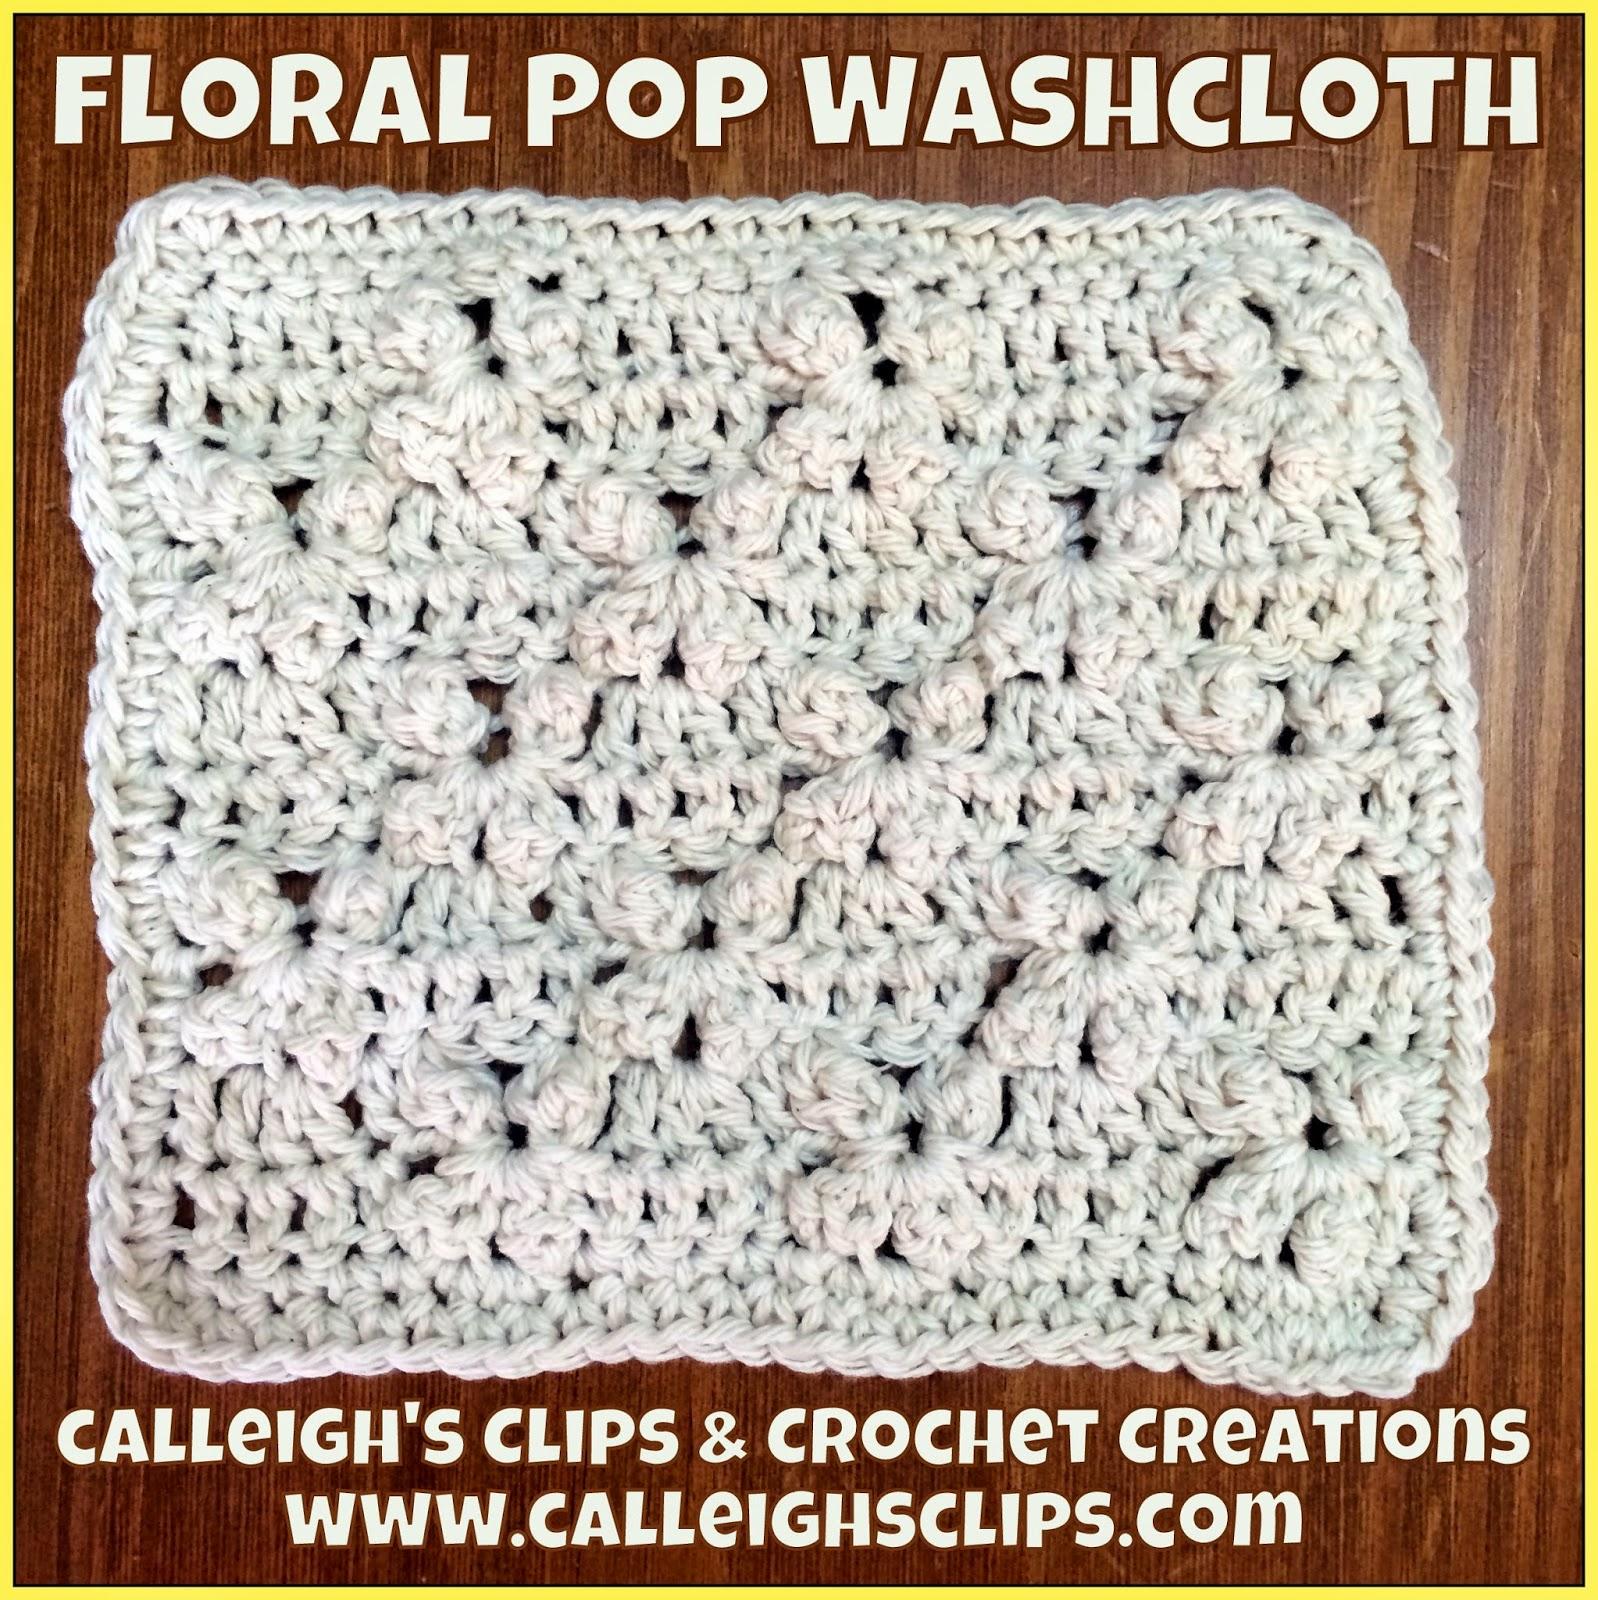 25 Crochet FLOWER Patterns - Floral Fixation